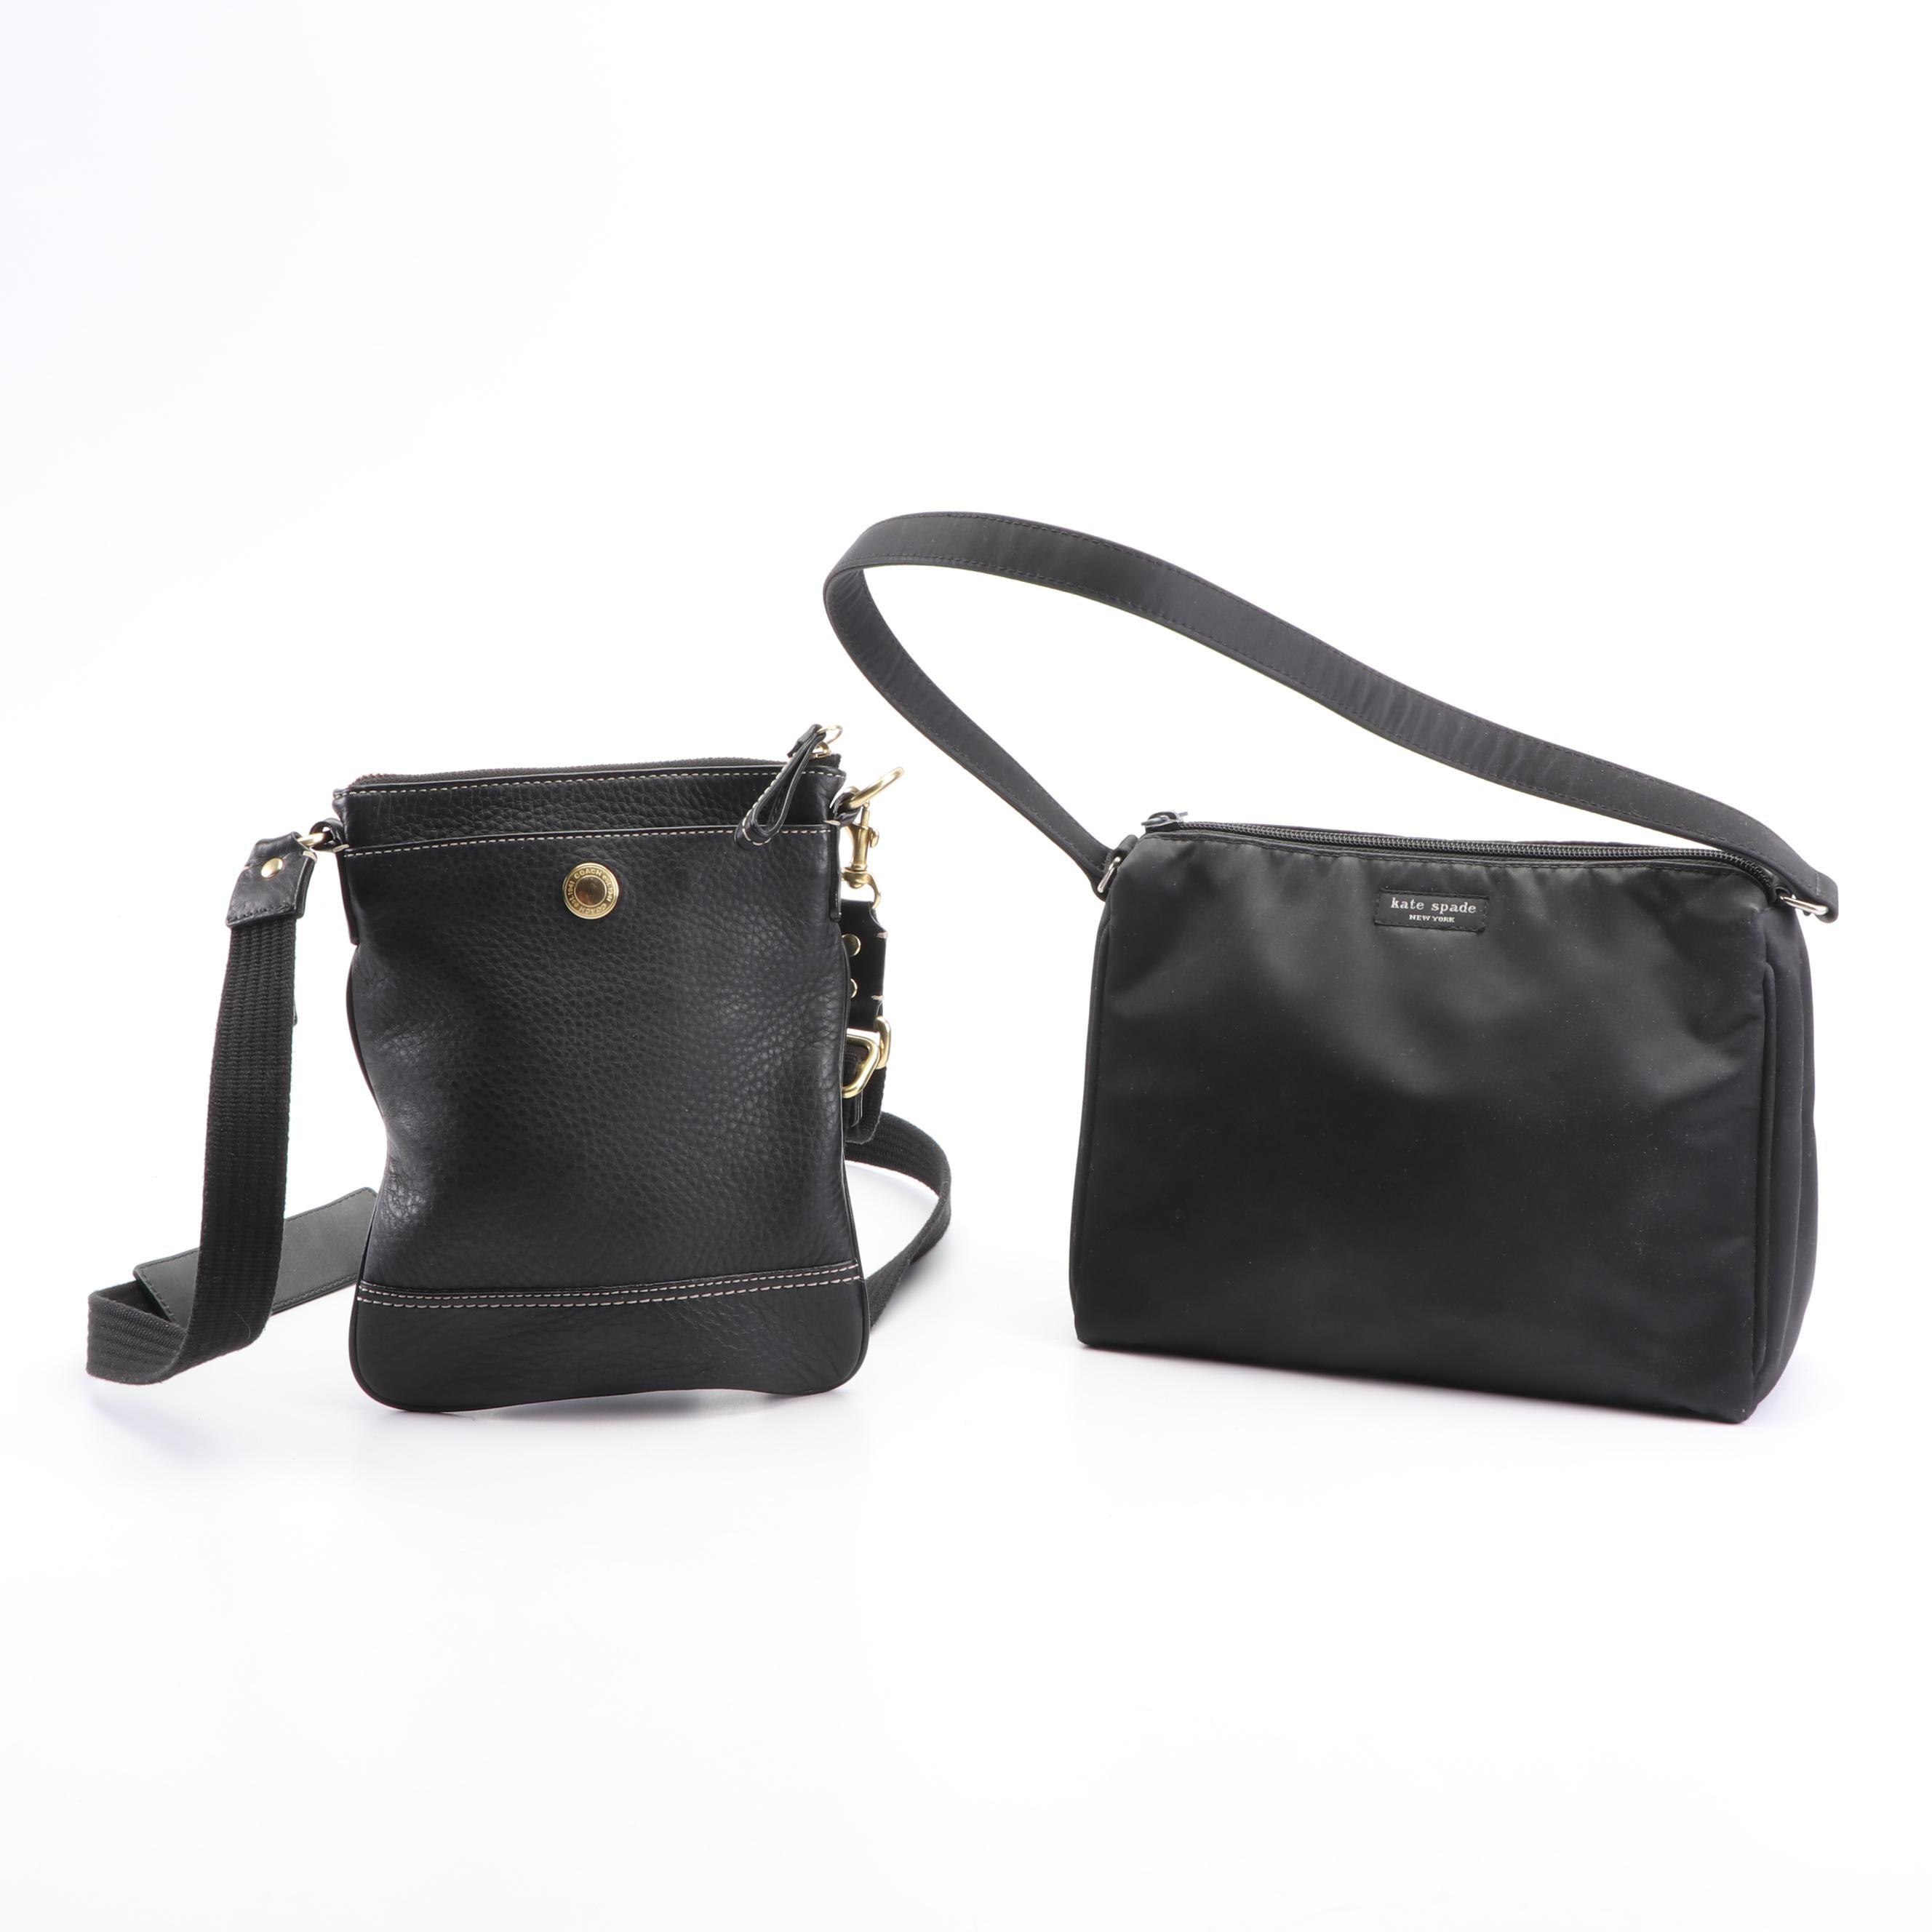 Coach Black Pebbled Leather Crossbody and Kate Spade New York Nylon Handbag